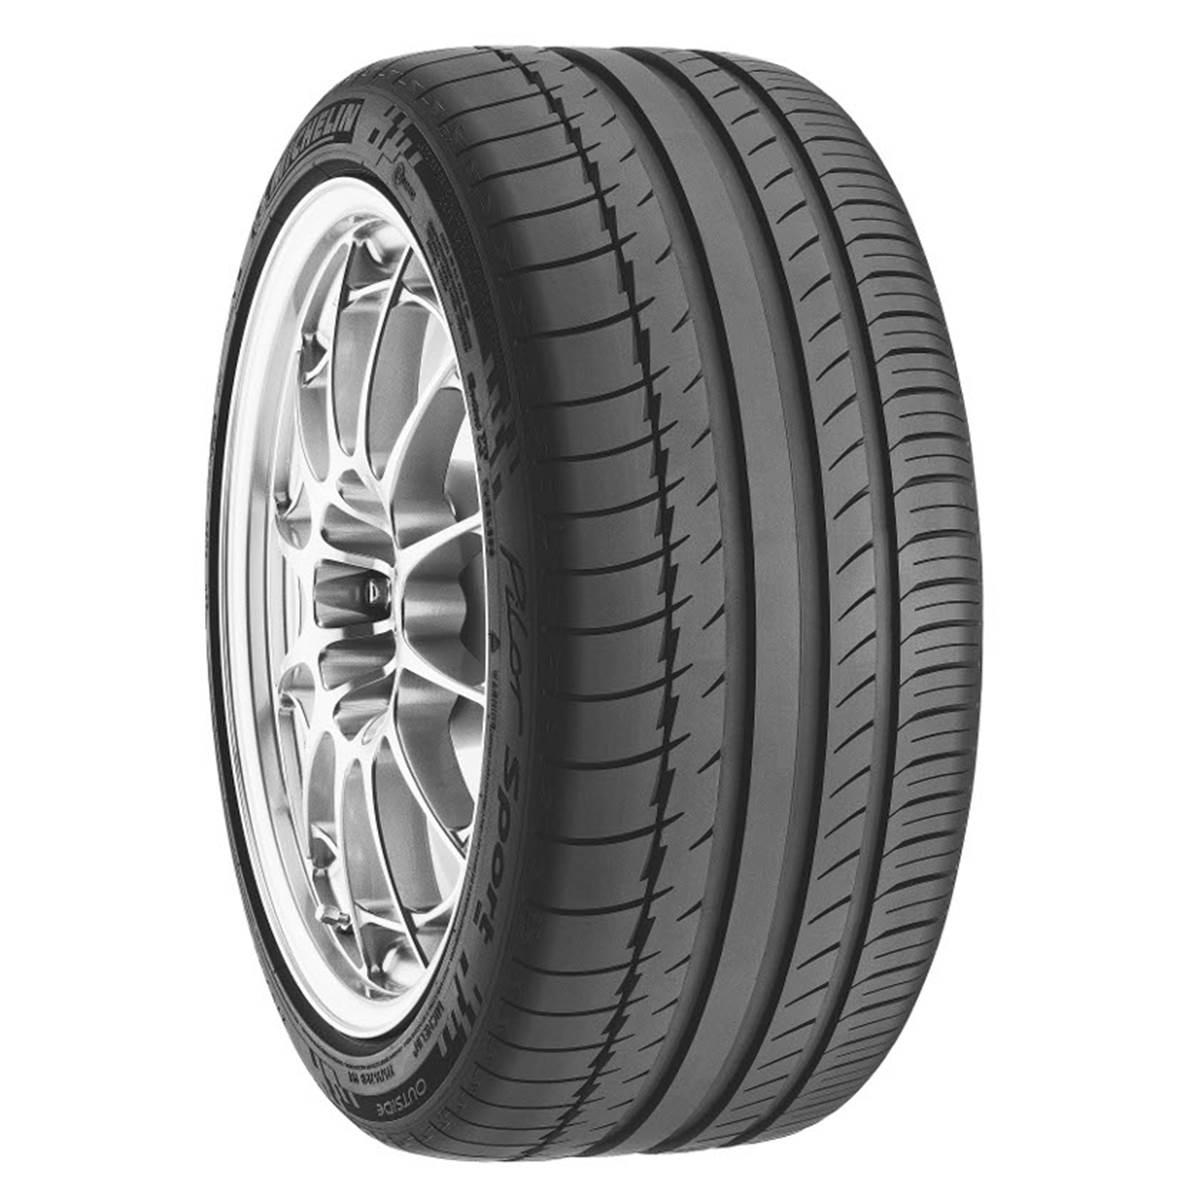 Pneu Michelin 245/35R18 92Y Pilot Sport Ps2 XL